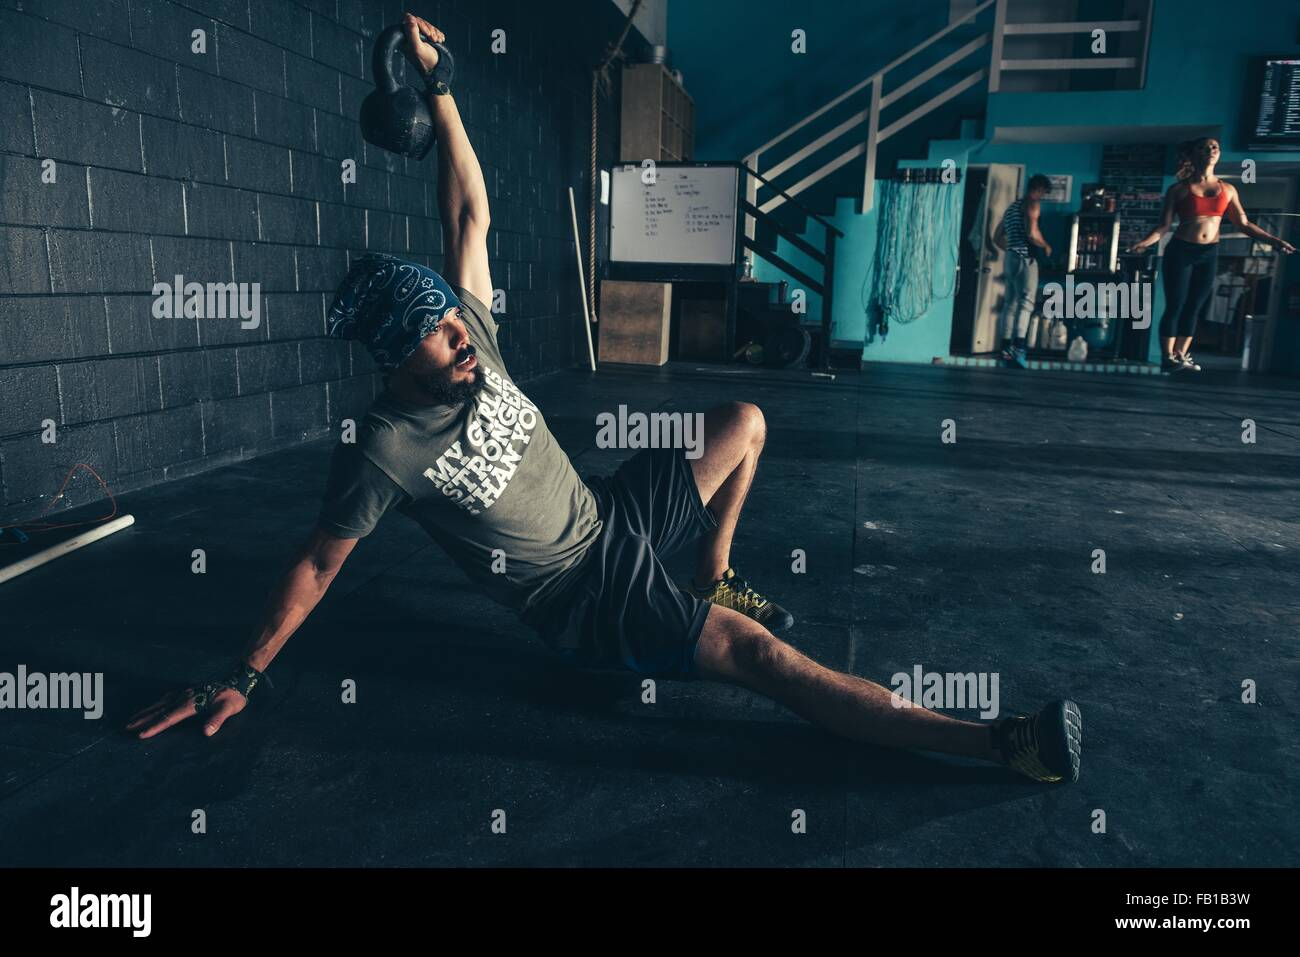 Hombre levantamiento kettlebell en gimnasio Imagen De Stock